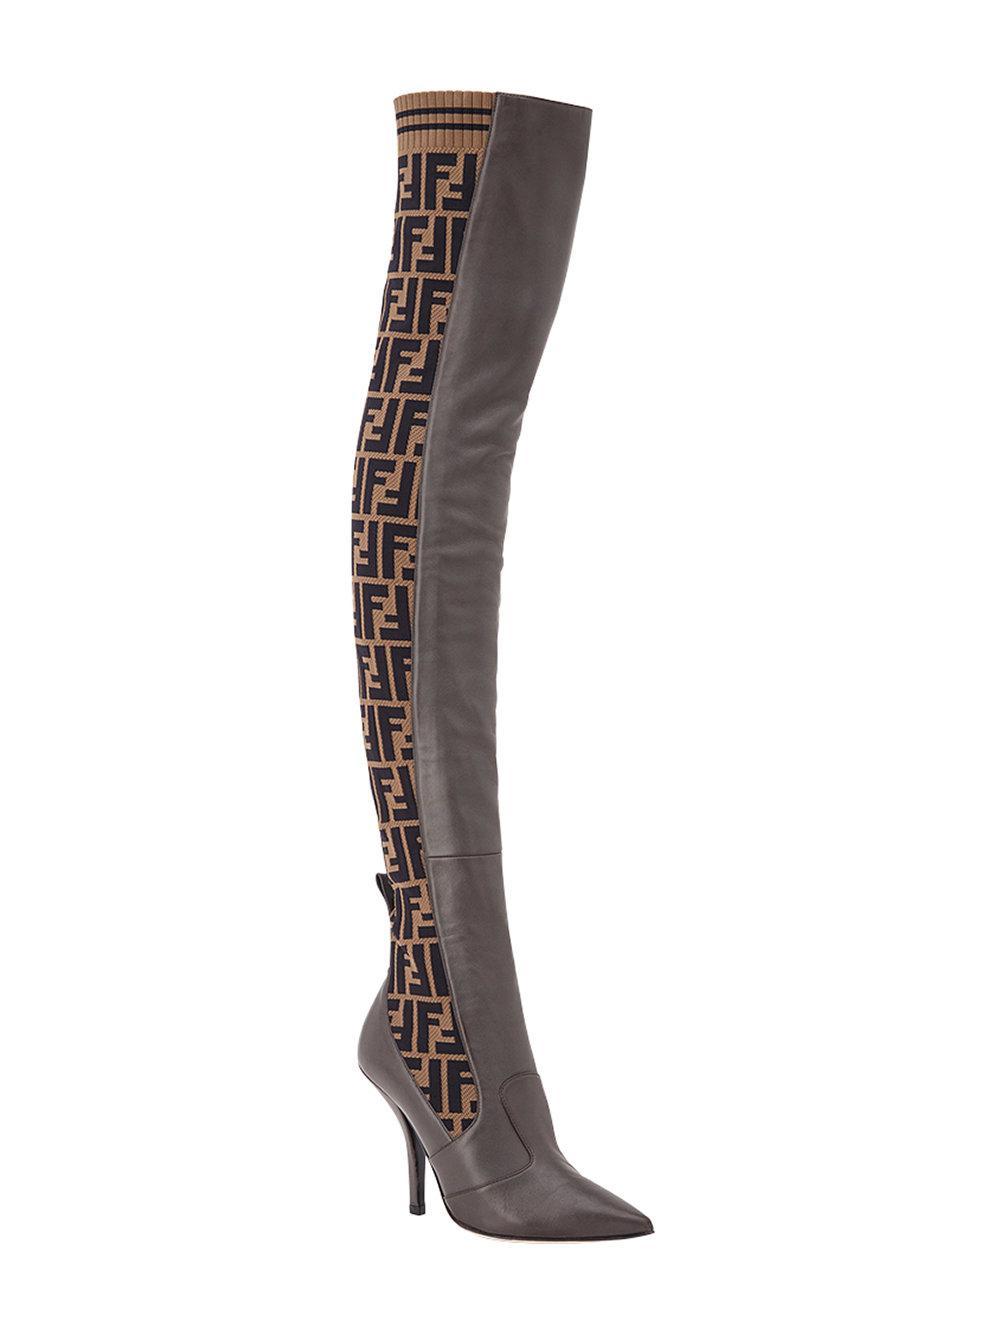 3c163d077e5 Lyst - Fendi Ff Motif Thigh-high Boots in Brown - Save 9%